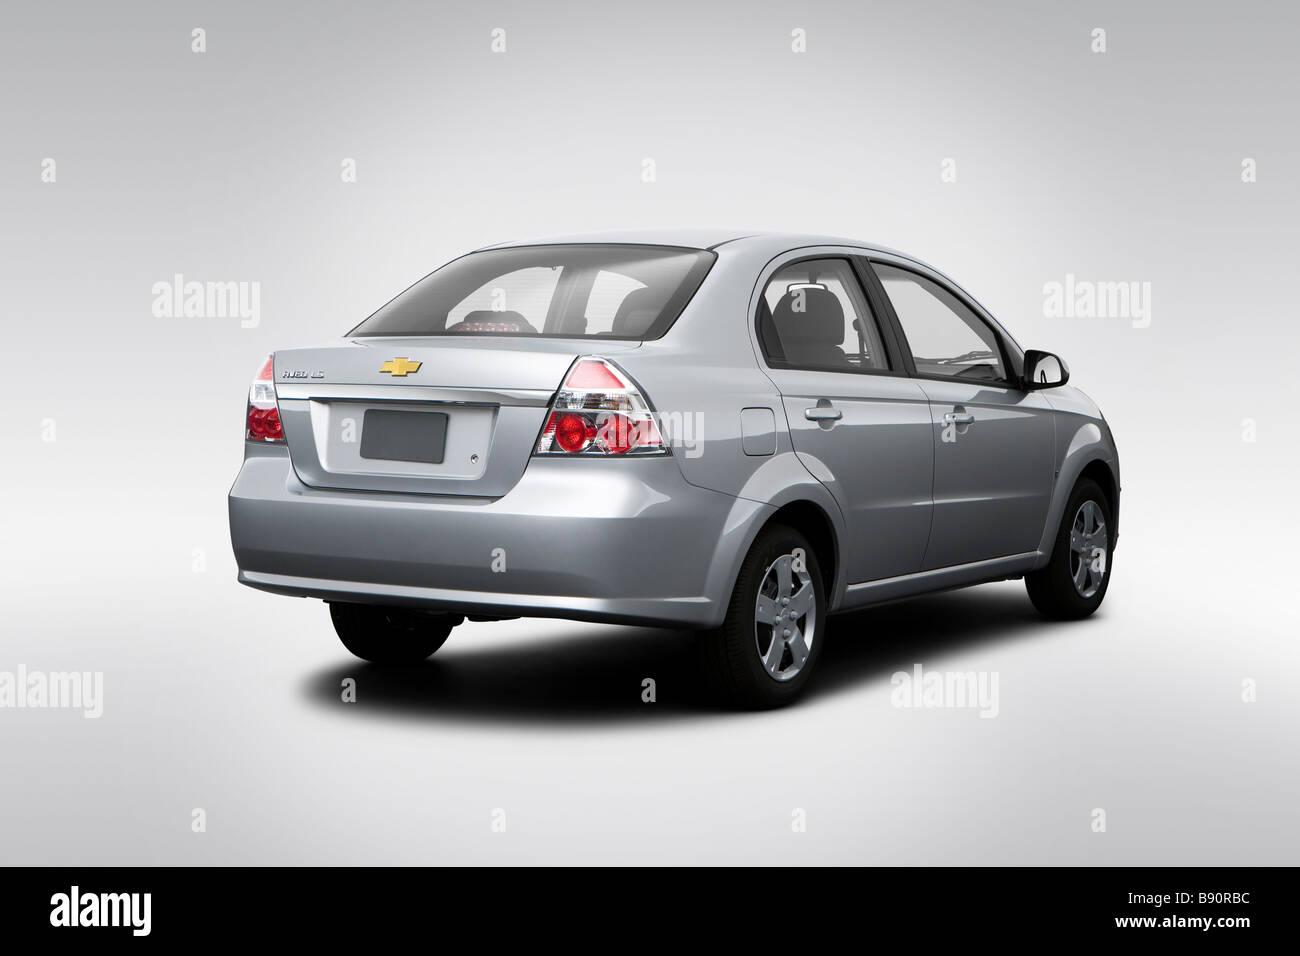 Kekurangan Chevrolet Aveo 2009 Tangguh